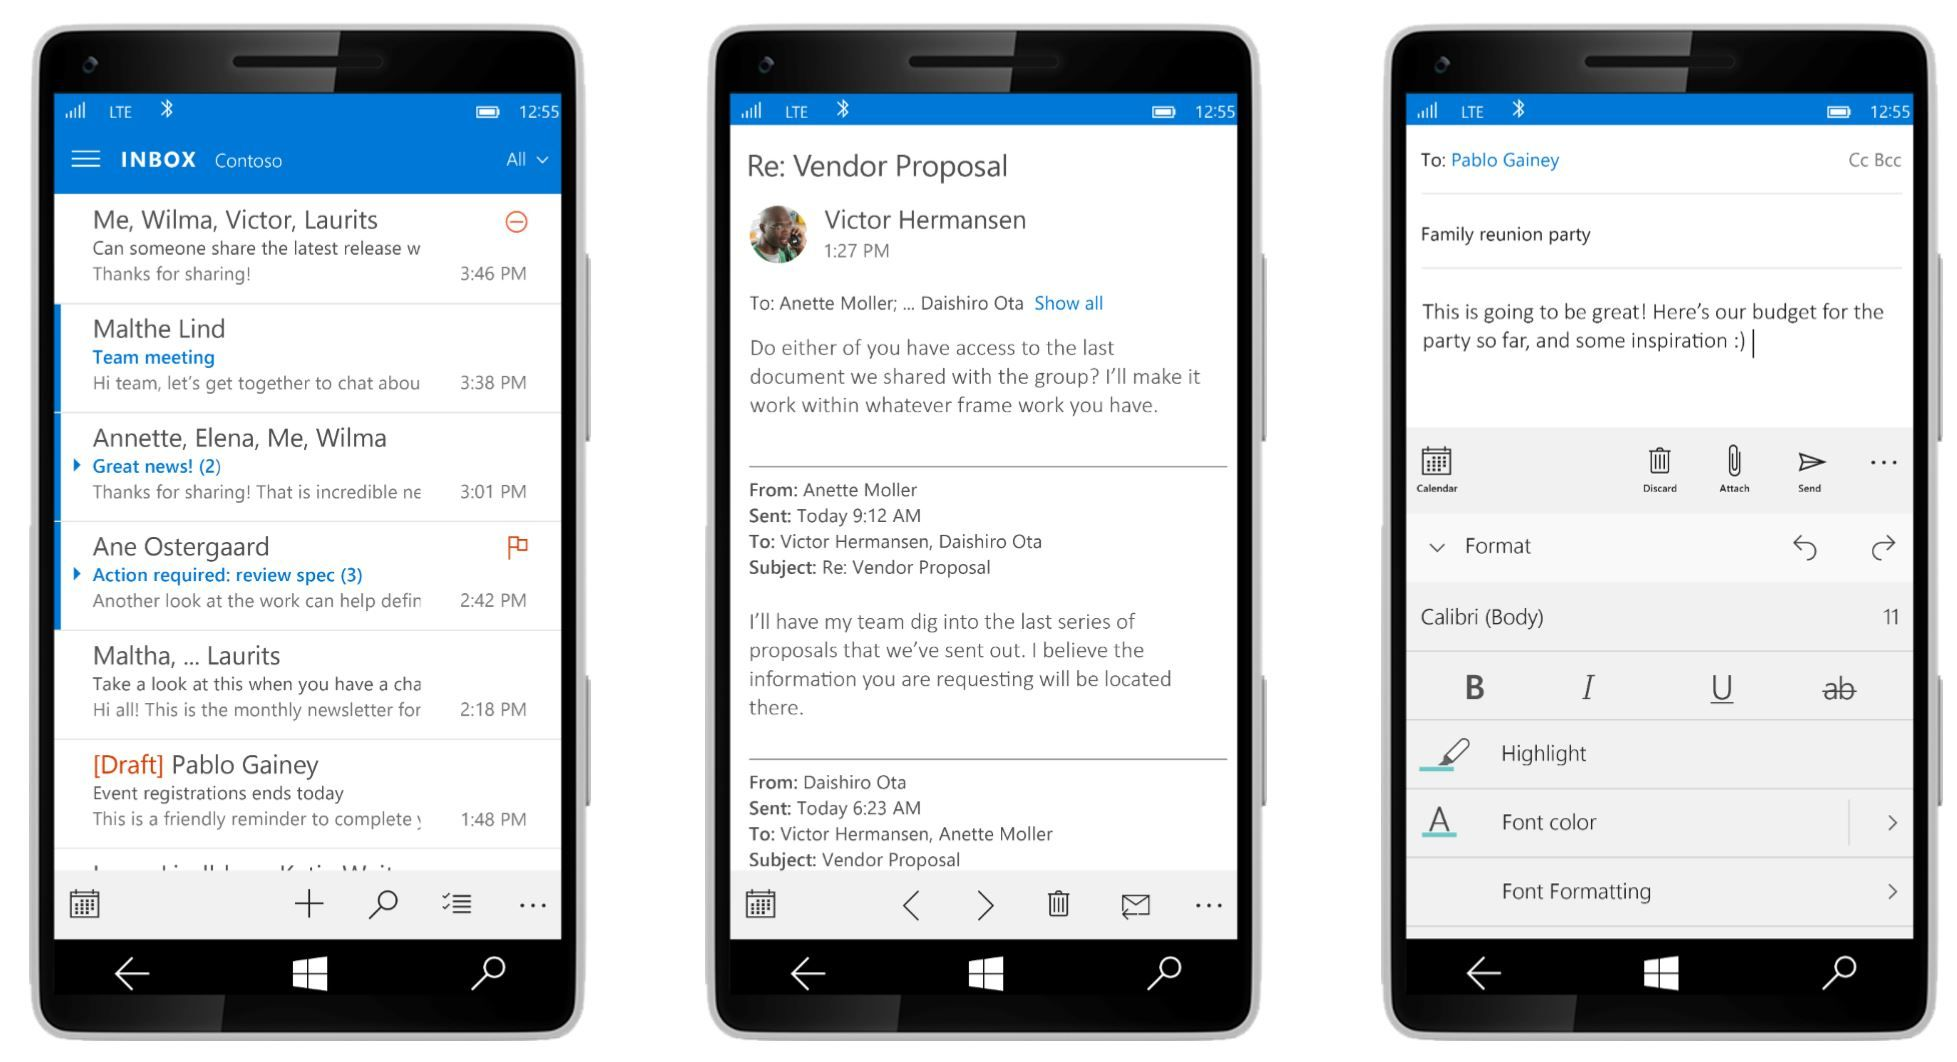 Outlook Mail and Calendar app gets Calendar Printing